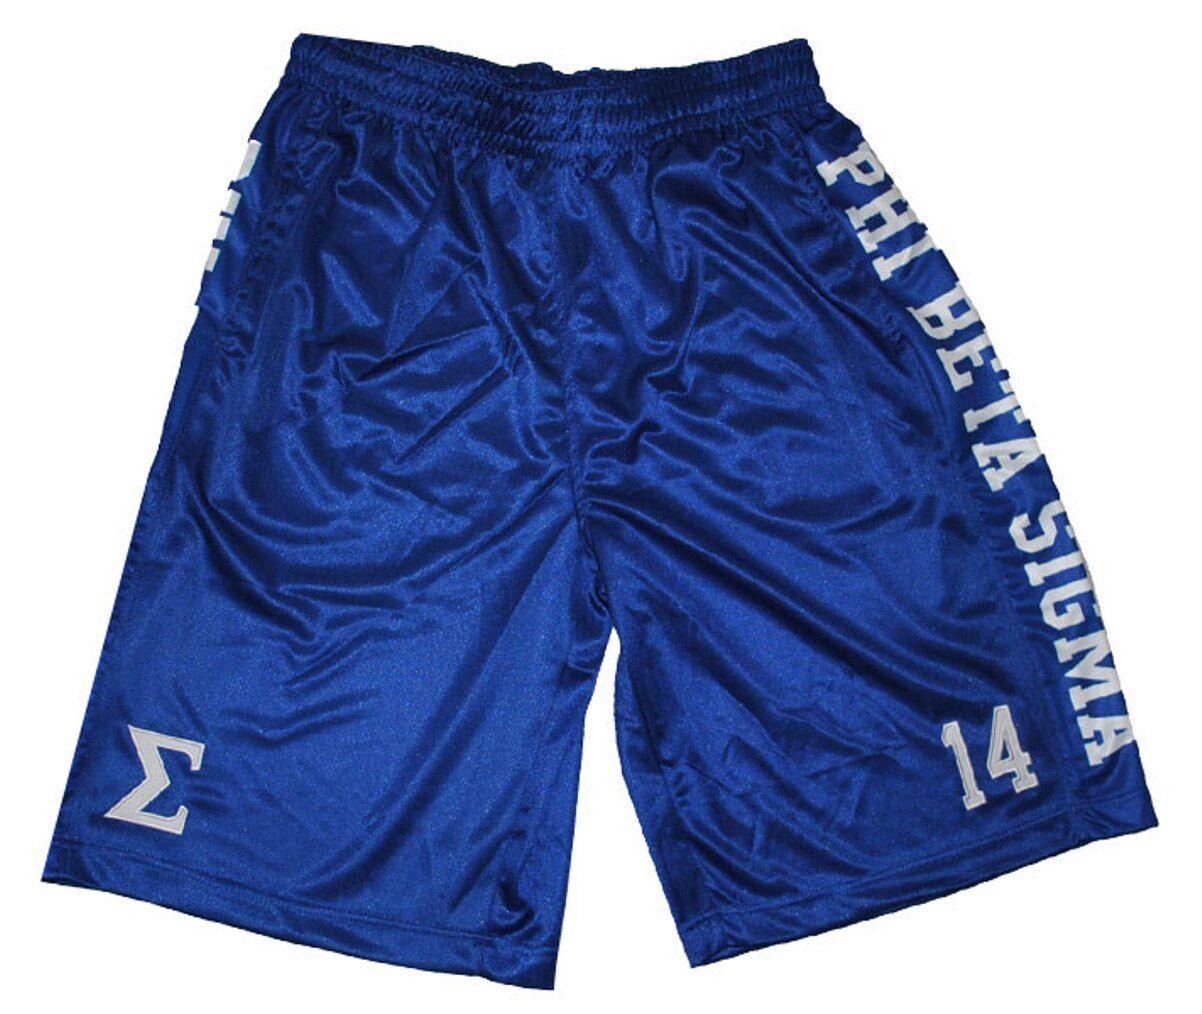 Phi Beta Sigma Fraternity Mens Basketball Shorts bluee